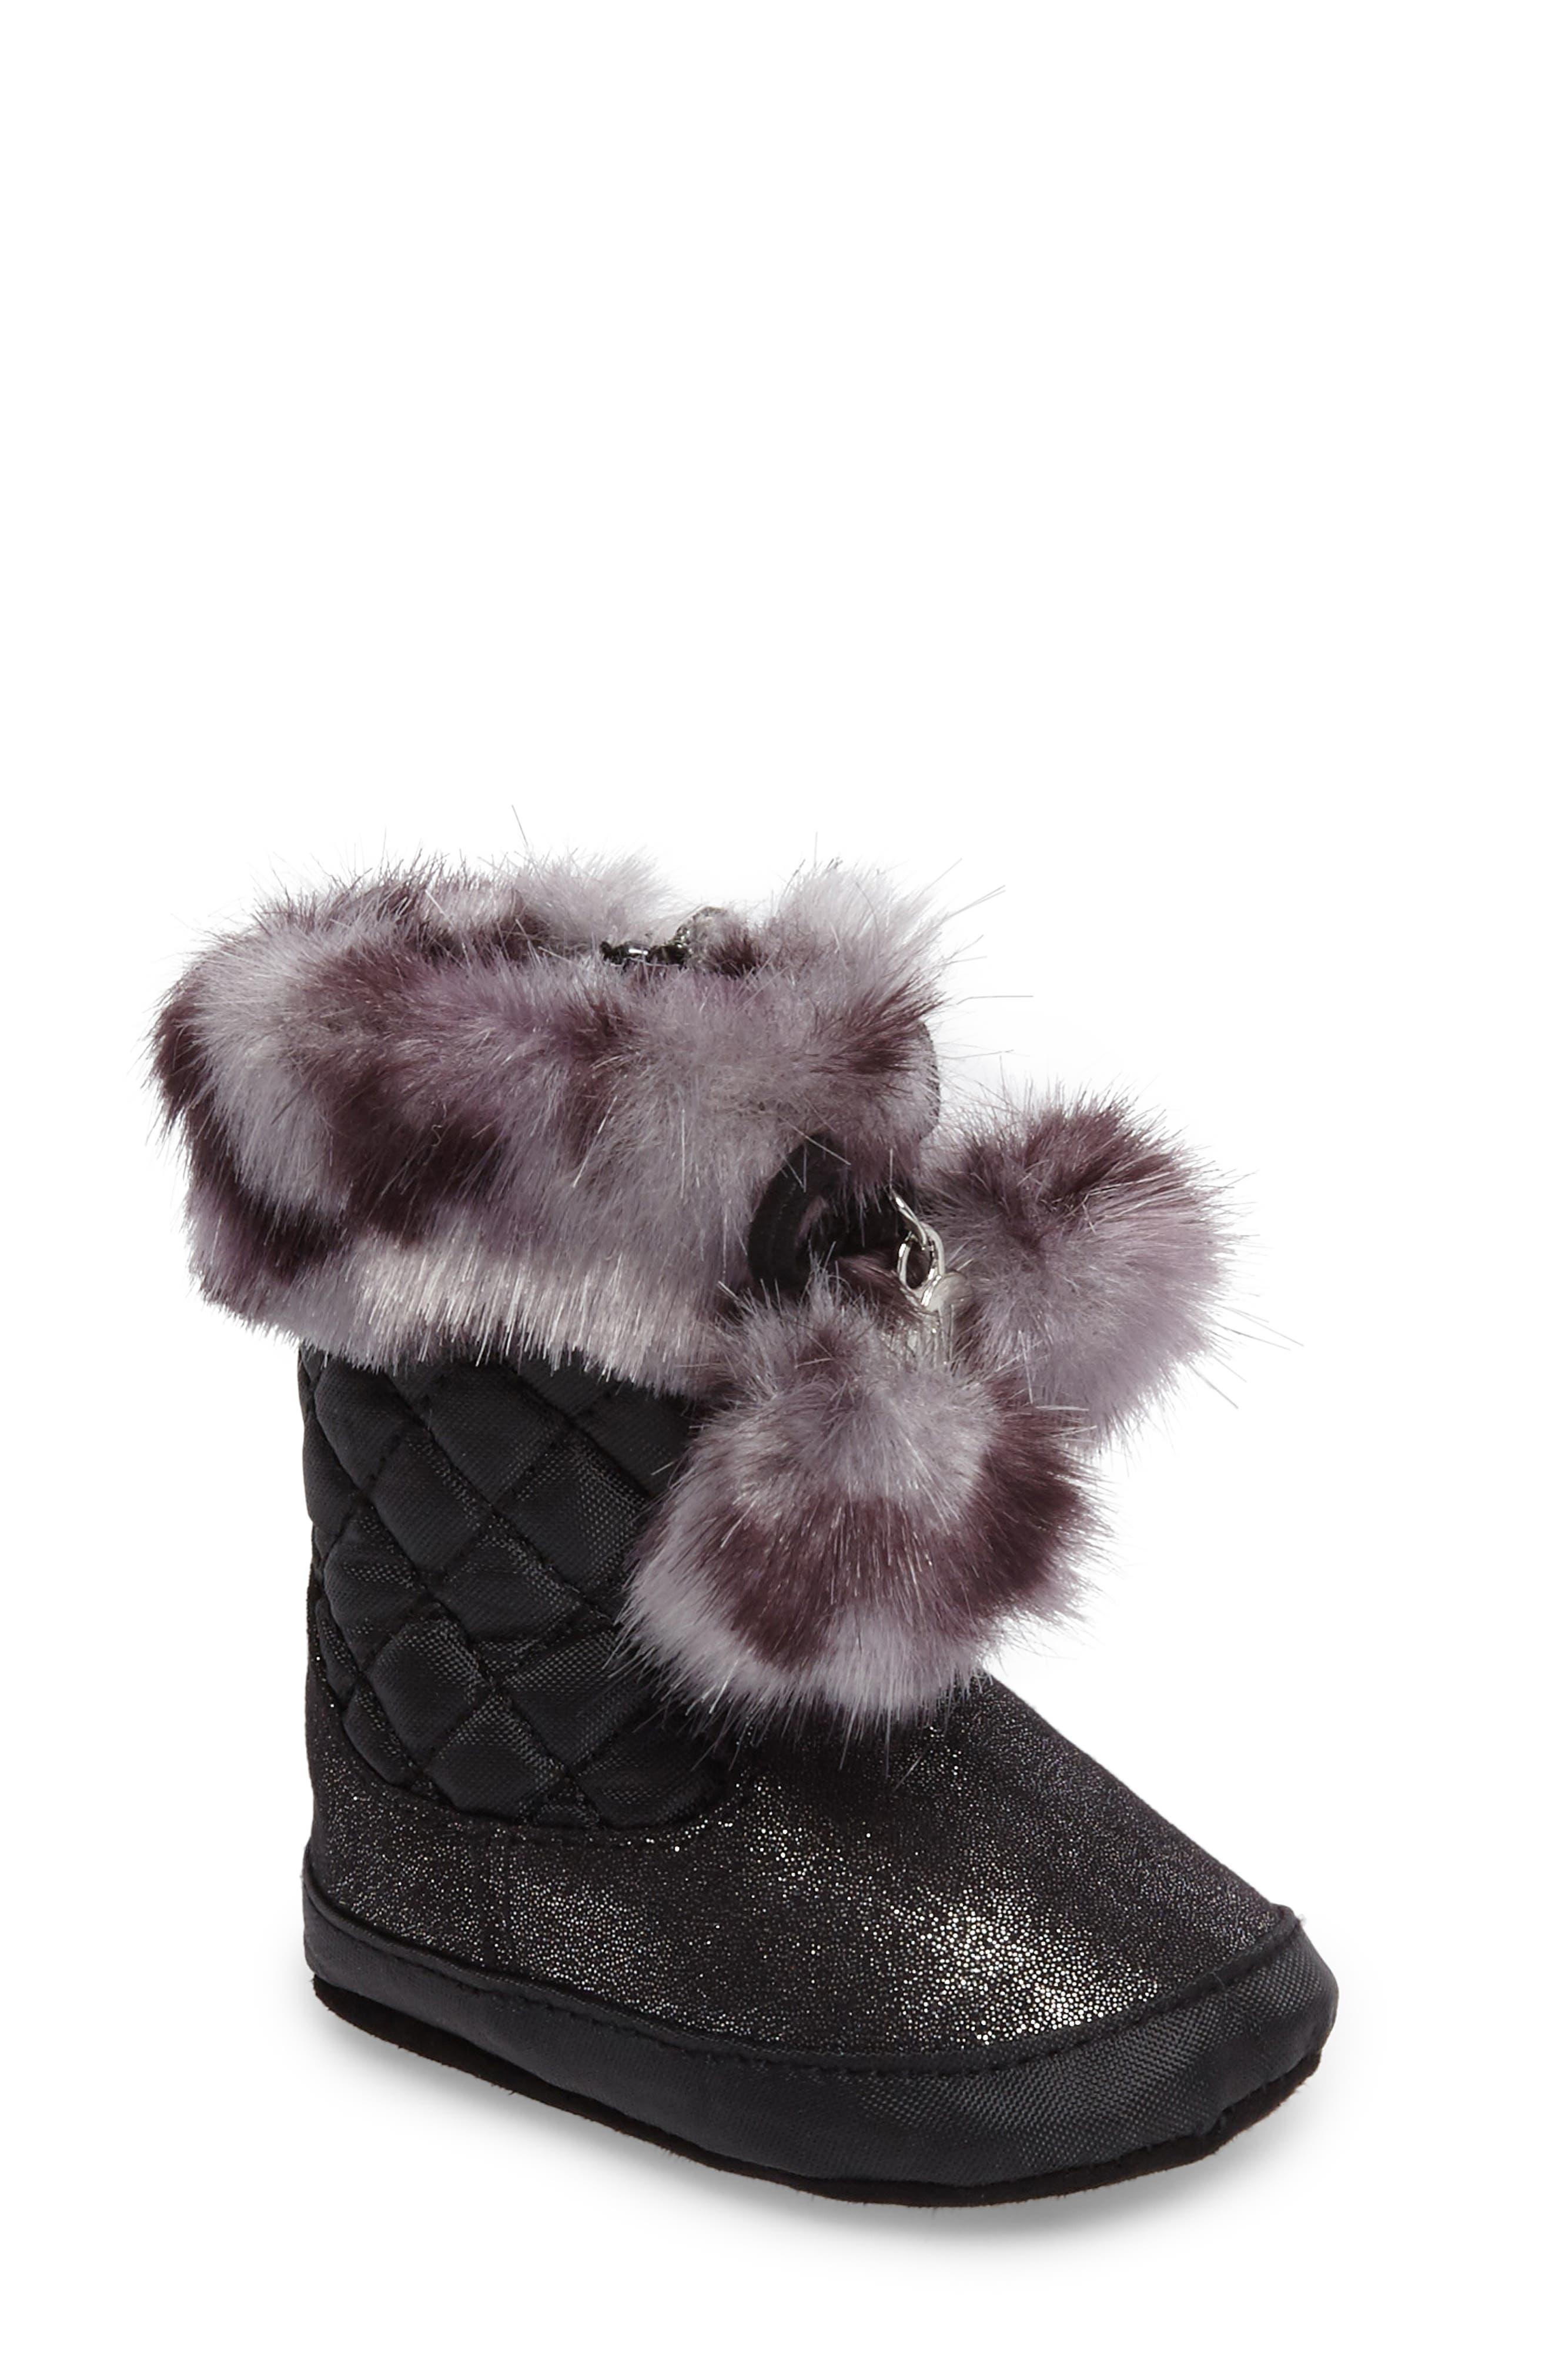 Stuart Weitzman Baby Sparkle Faux Fur Crib Bootie (Baby)